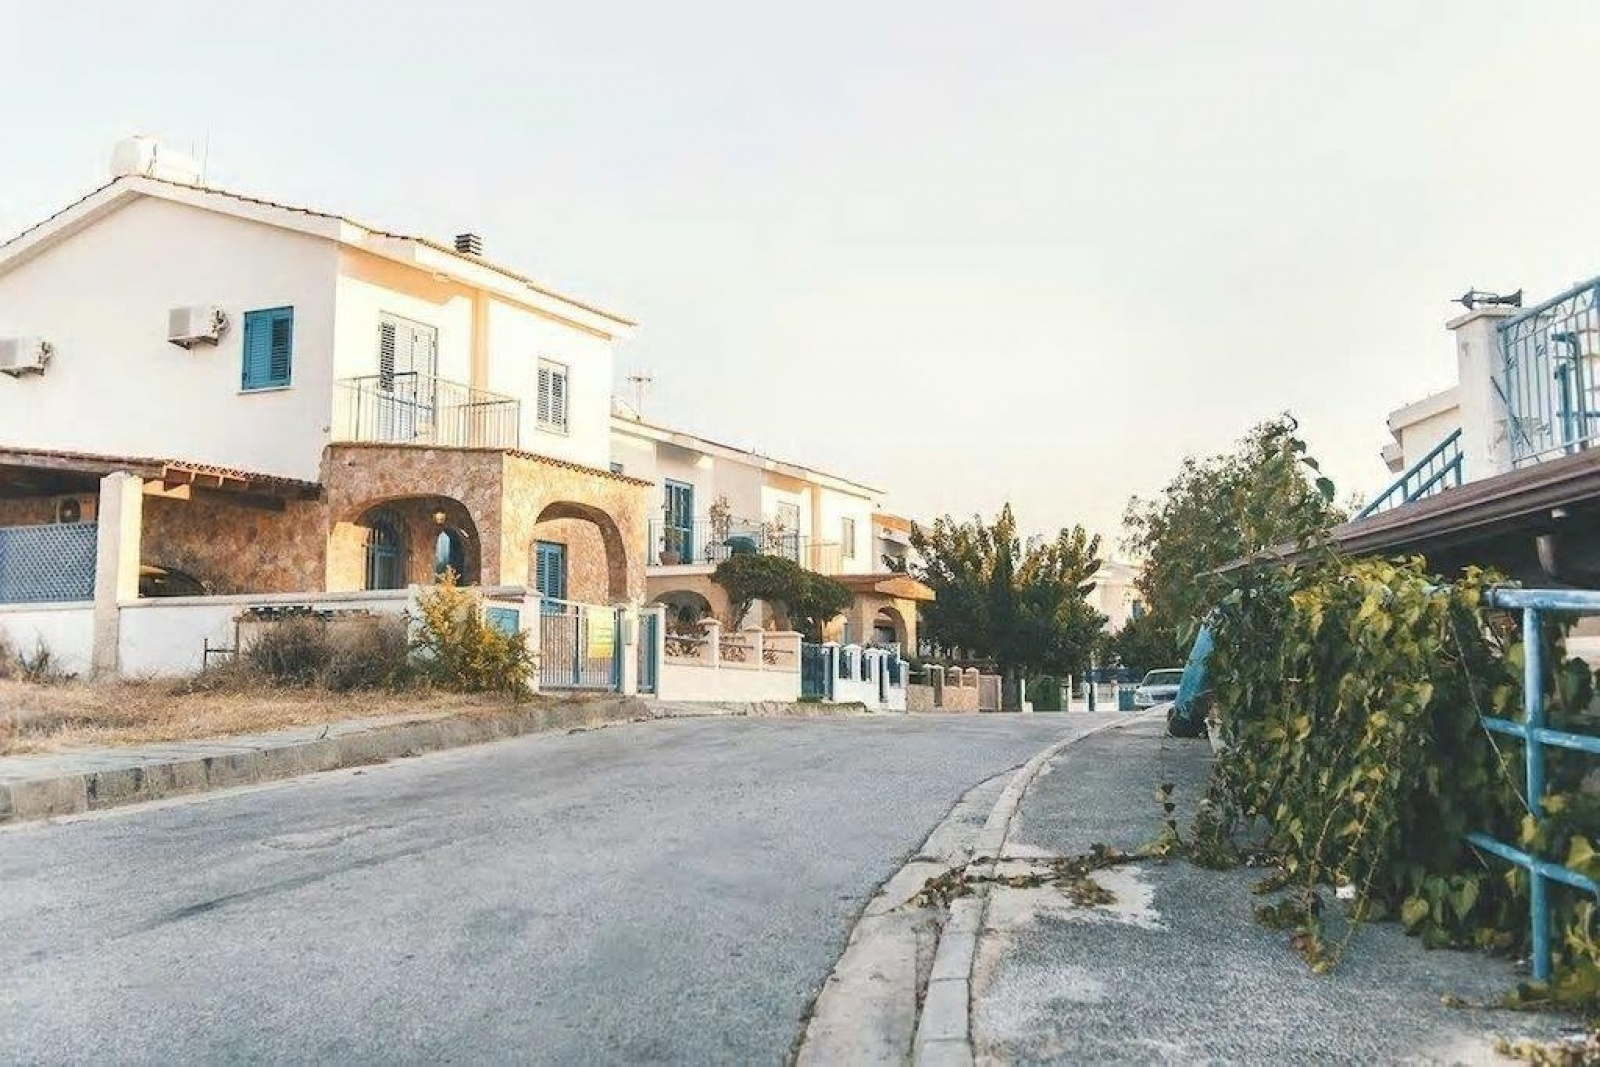 Residential Detached House - Prodromi detached House for Sale